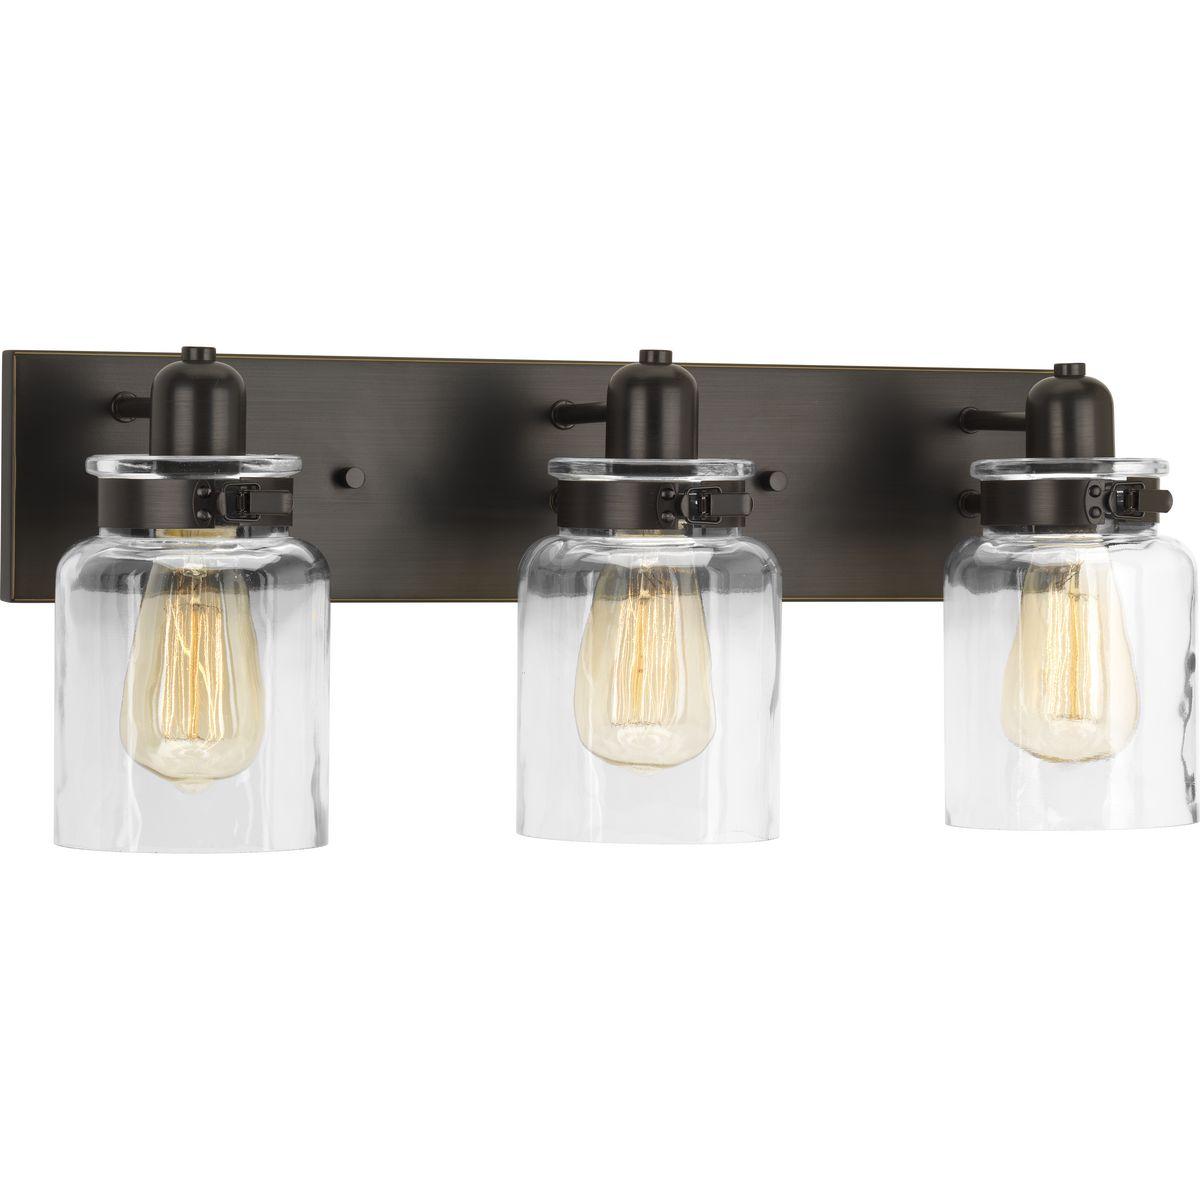 Calhoun Collection Three Light Bath Vanity P300047 020